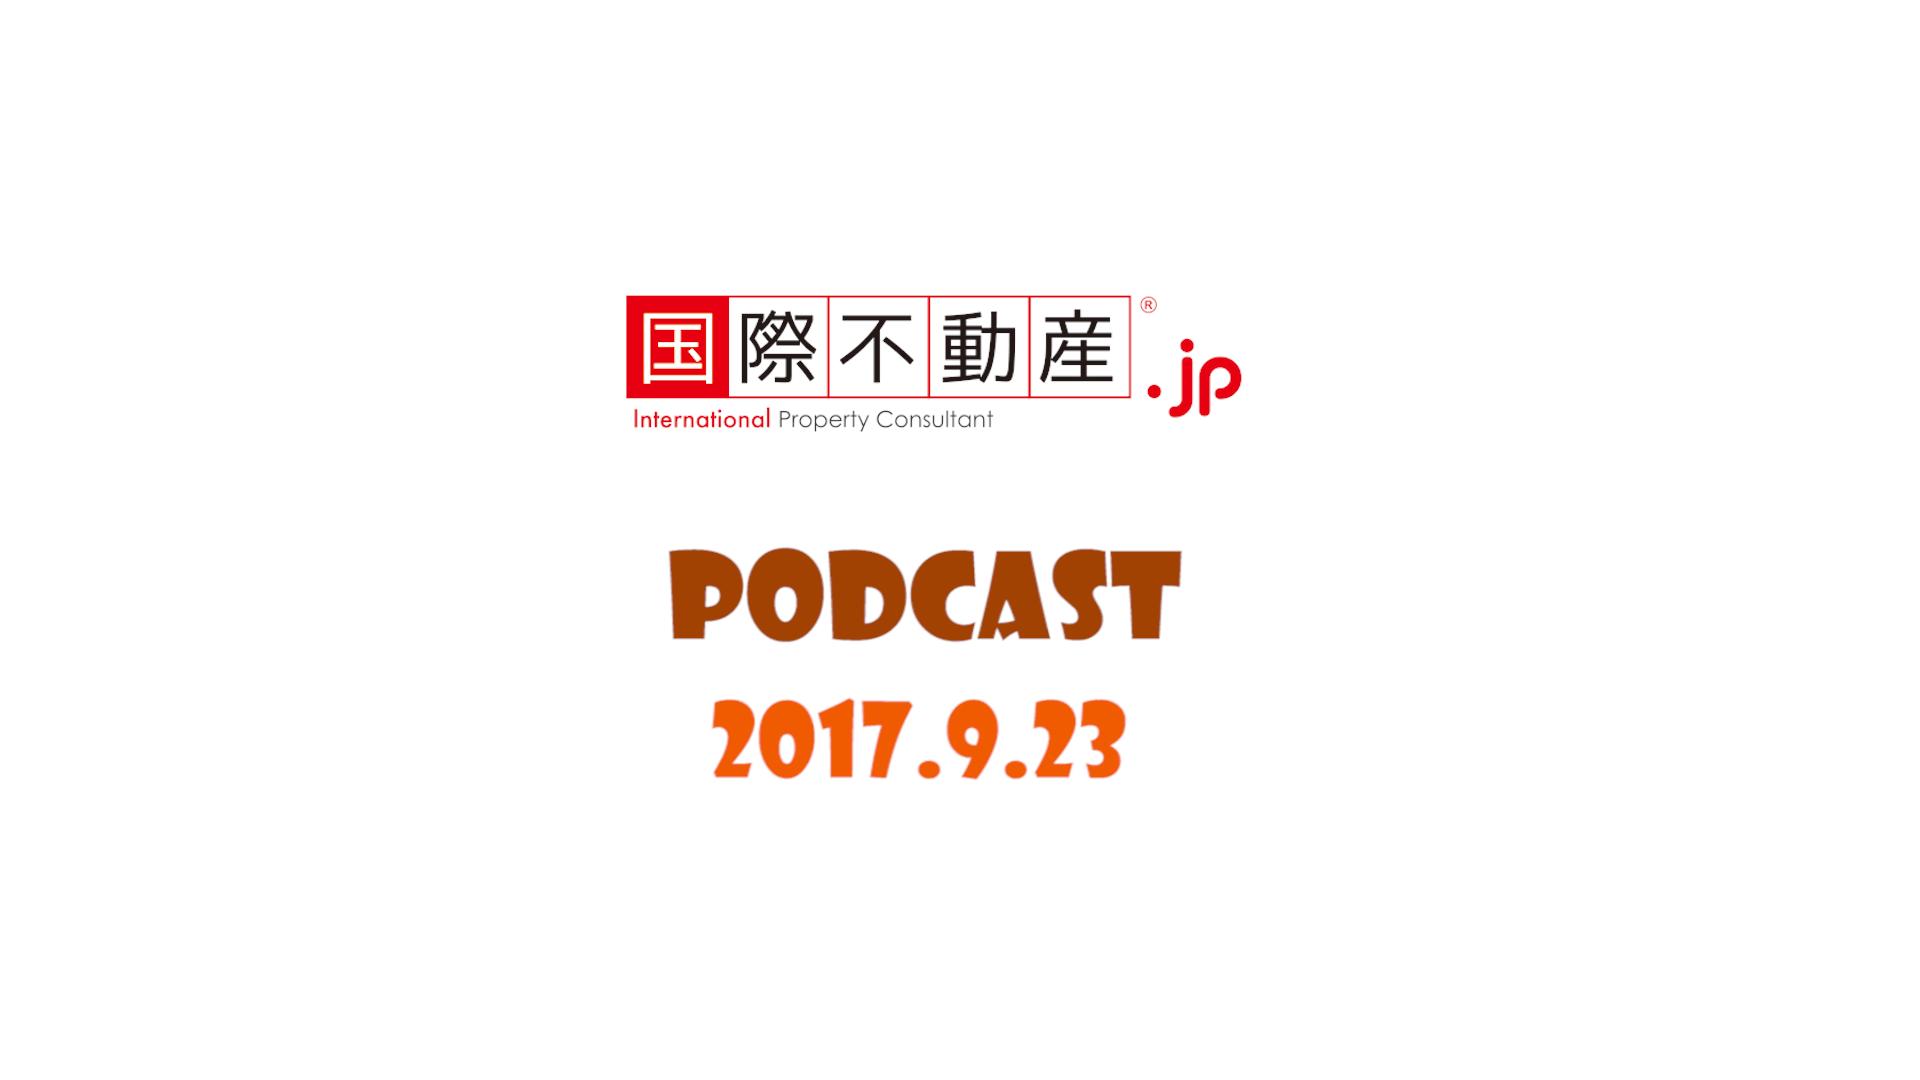 Podcast 収録風景(2017.9.23)